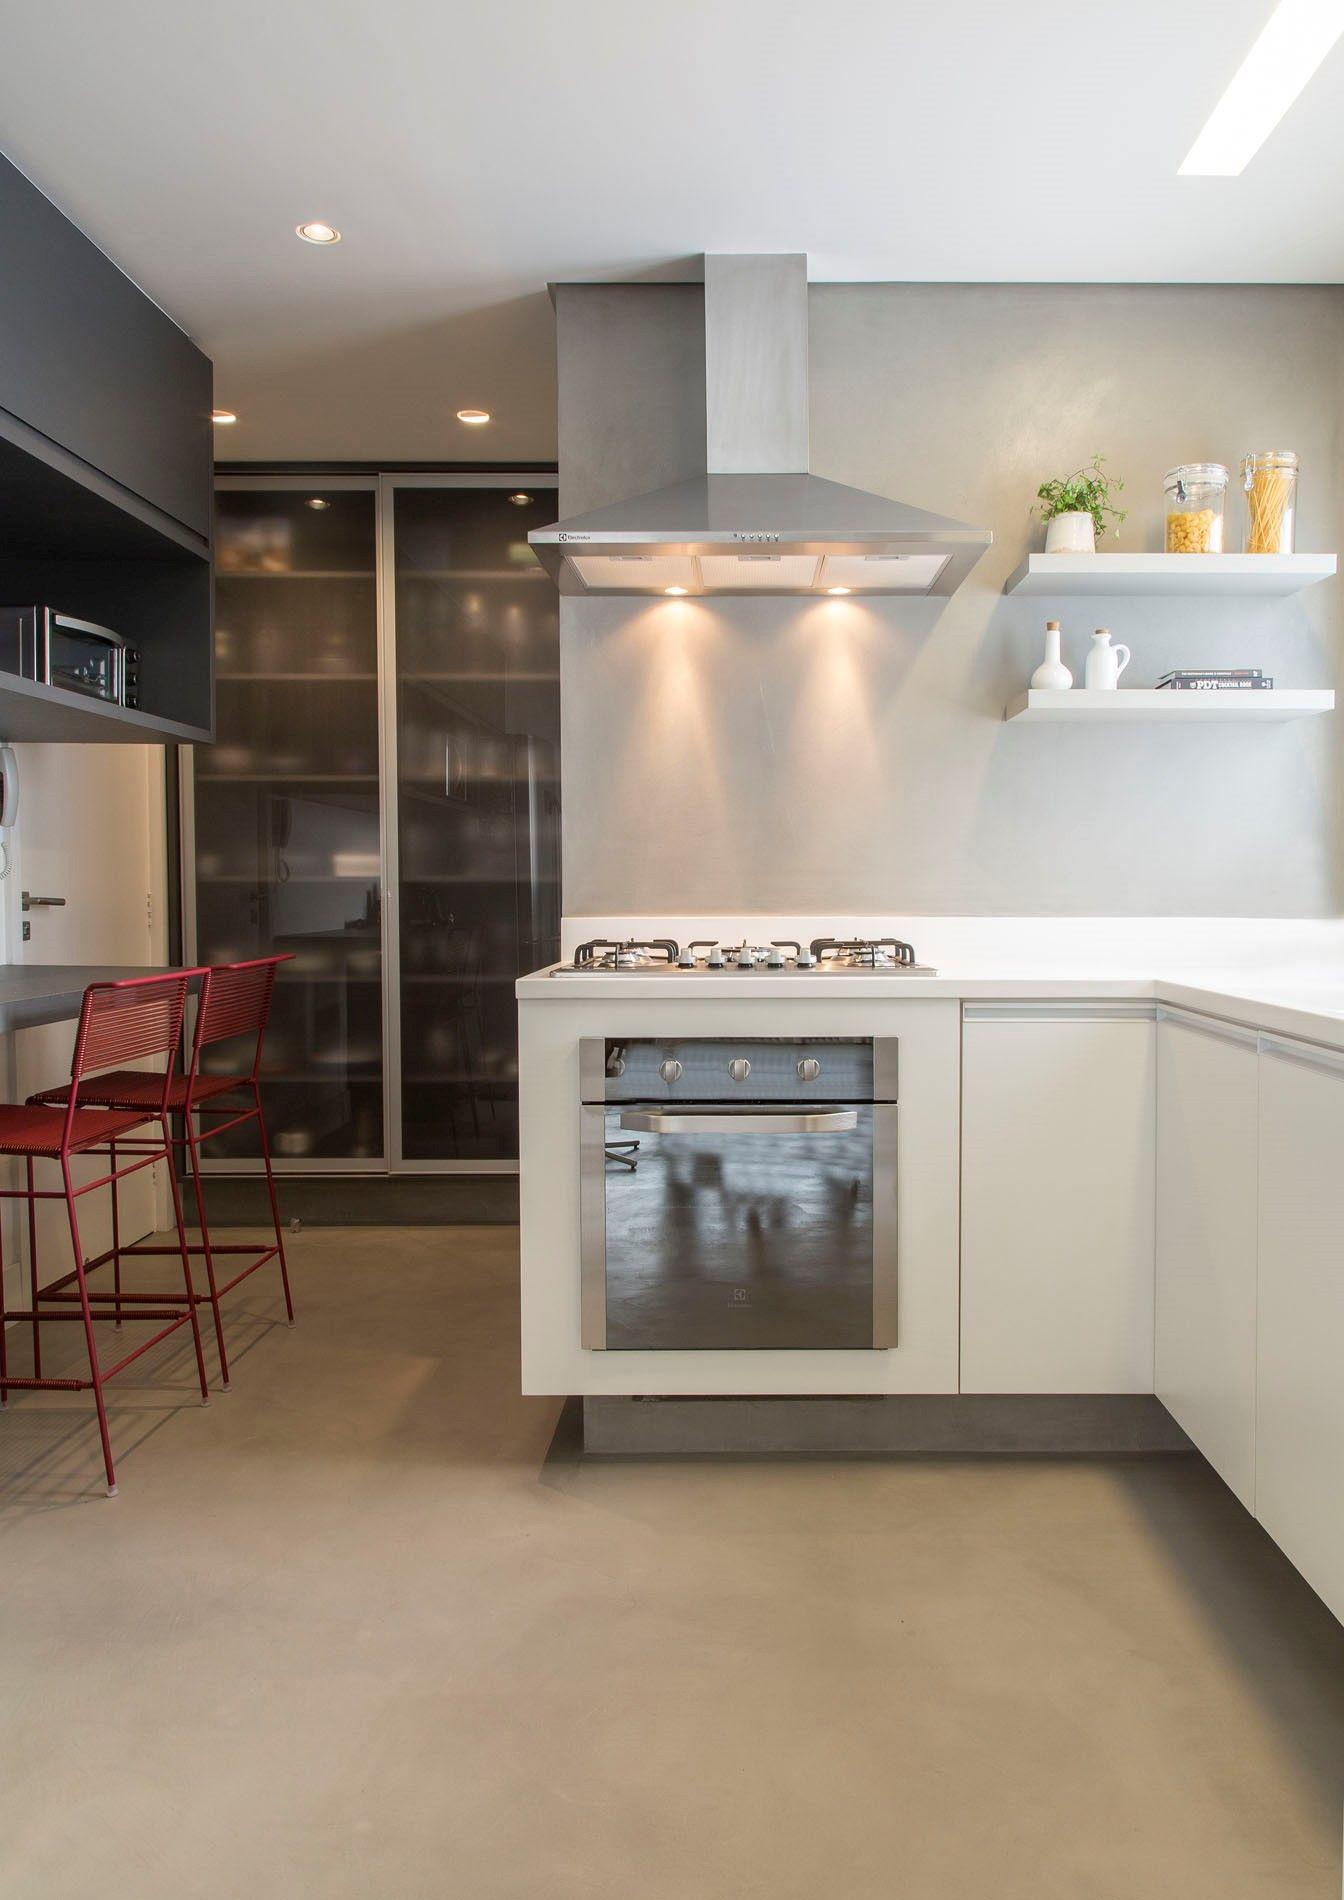 Cores De Porcelanato Para Cozinha Cores De Porcelanato Para Cozinha